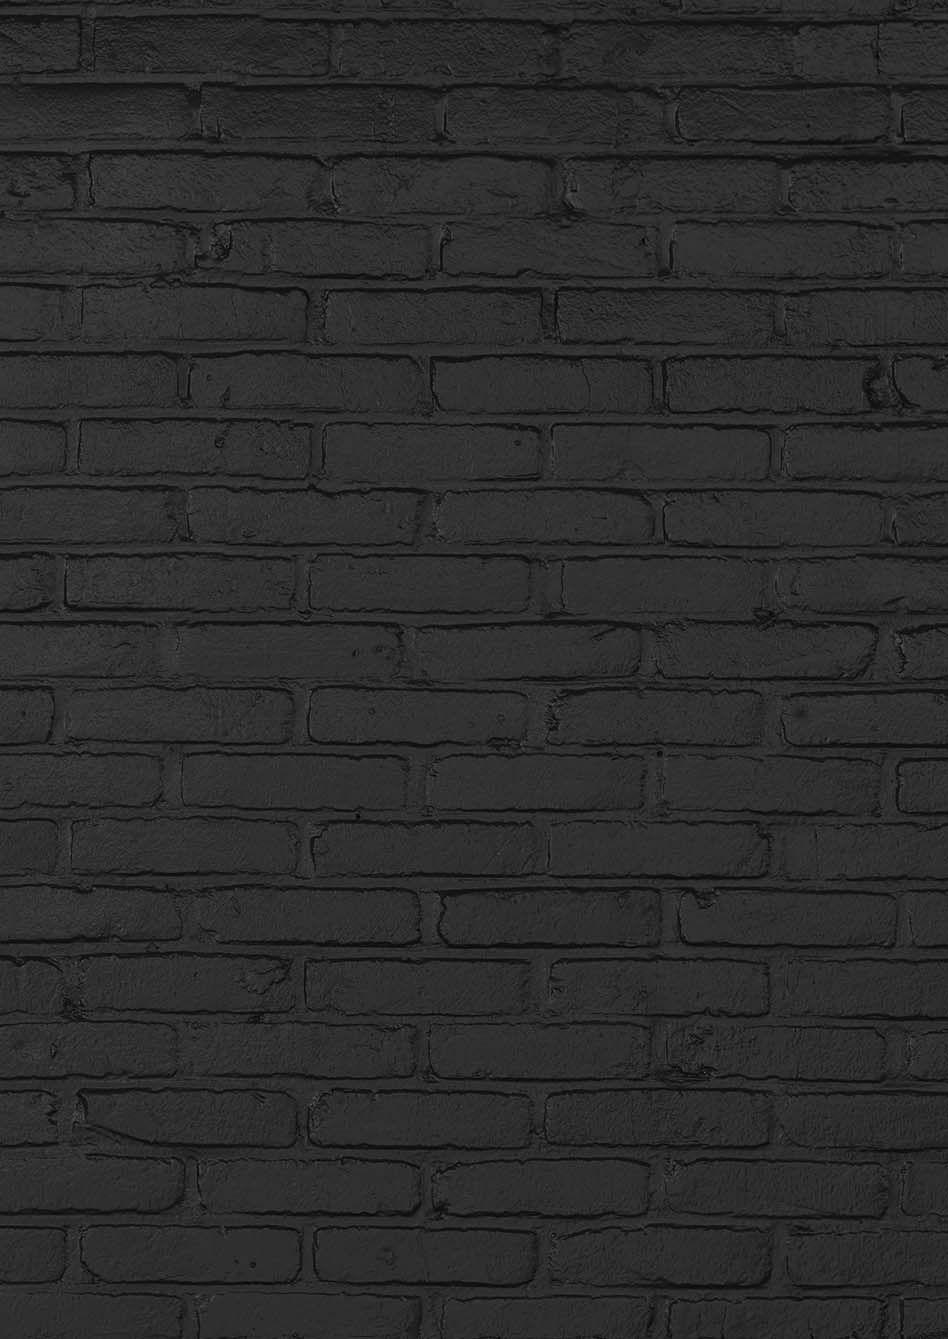 Black Brick Part - 17: Arthouse VIP Black Brick Wallpaper 623007 - Feature Wall Brick Faux Stone  Effect | Black Brick Wallpaper, Black Brick And Faux Stone